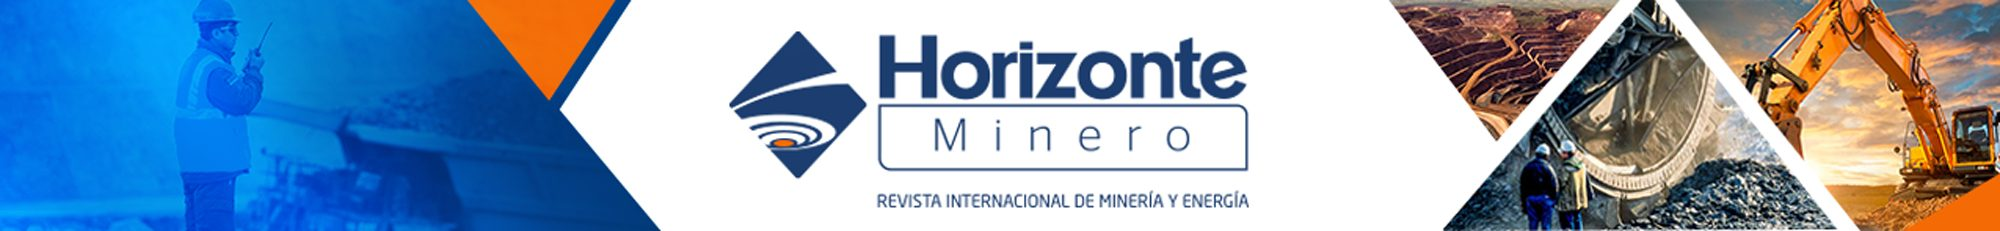 Revista Horizonte Minero